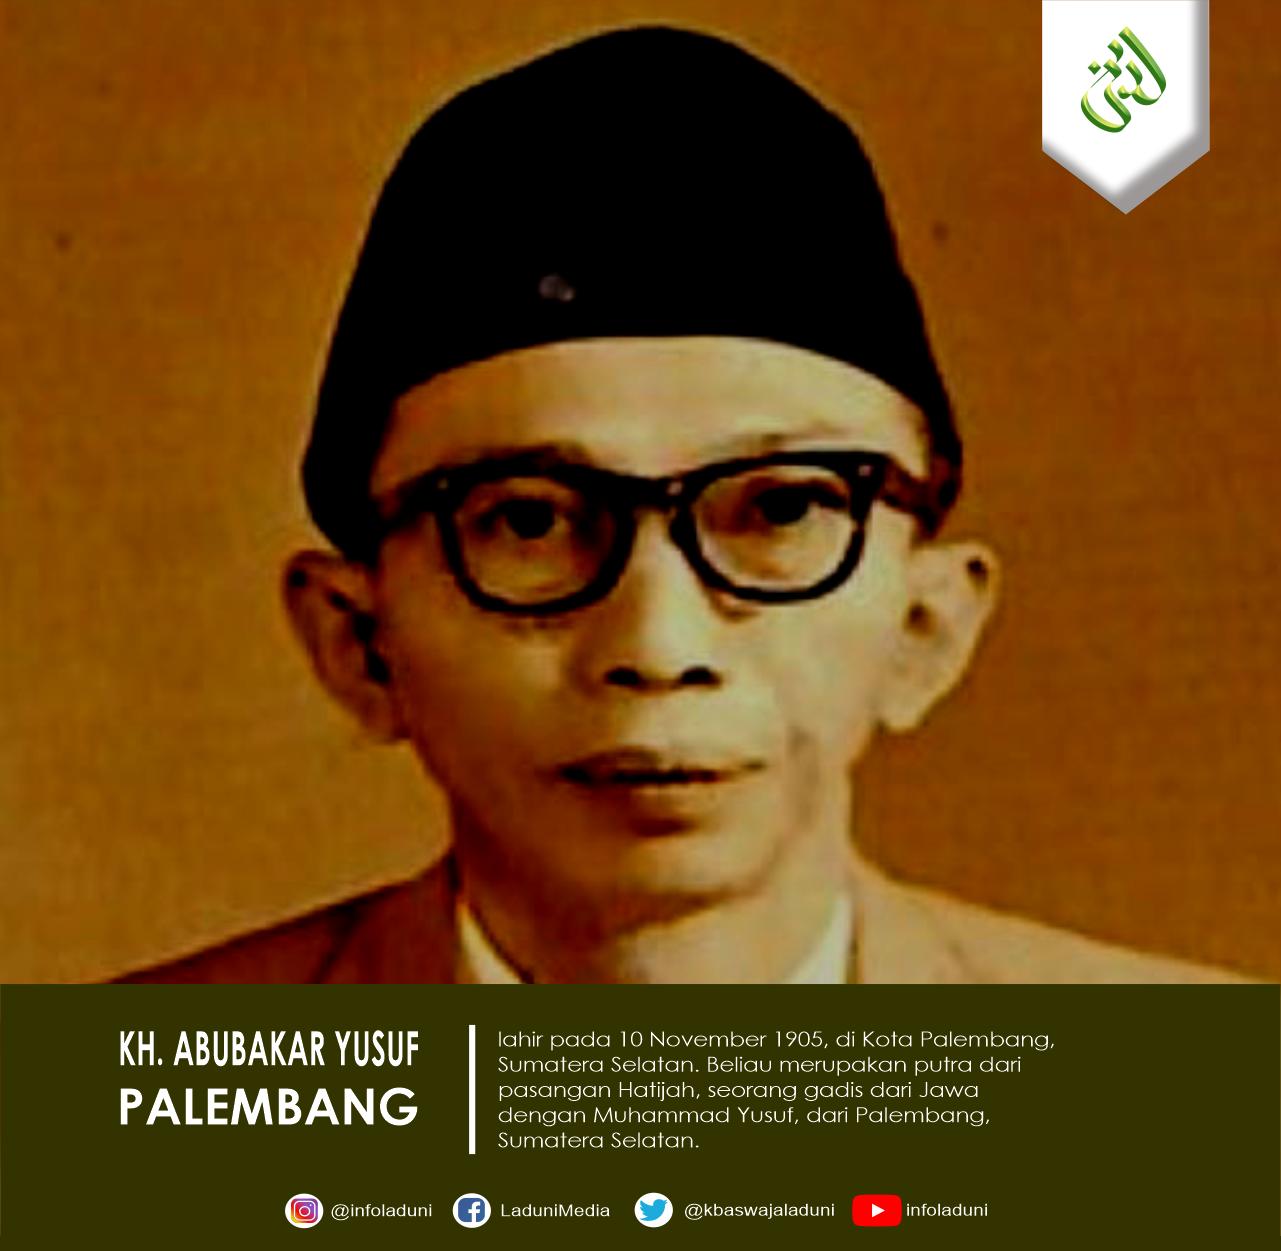 Biografi KH. Abubakar Yusuf Palembang